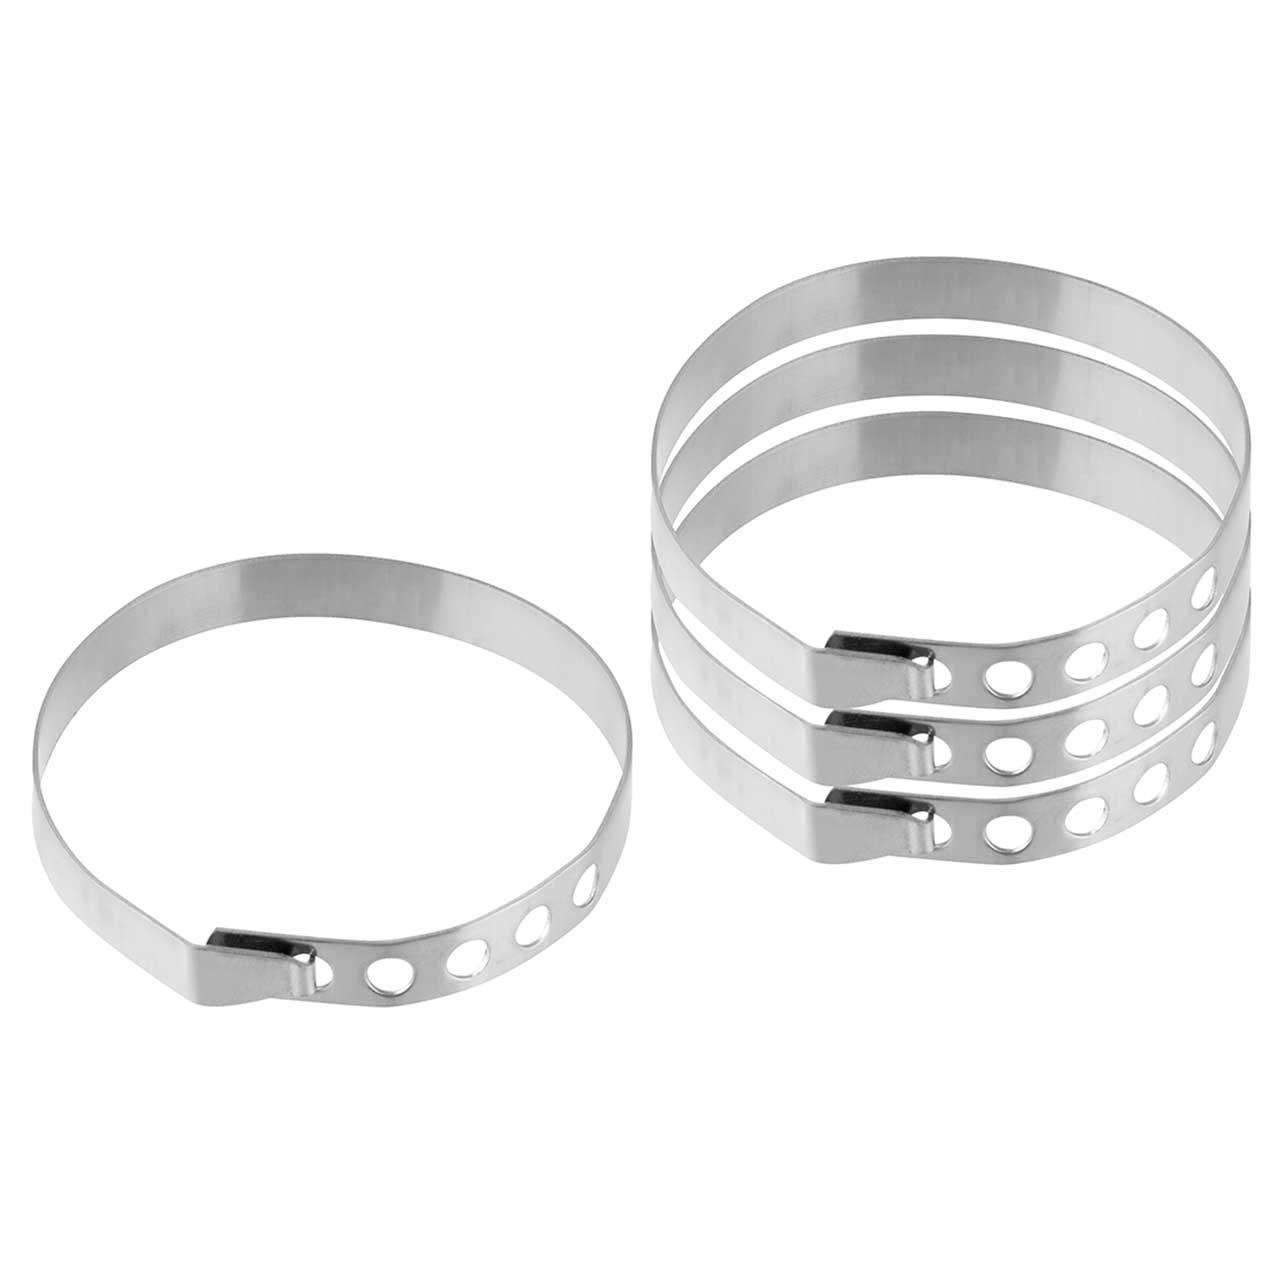 حلقه رولت فکلمن بسته چهار عددی مدل 56902